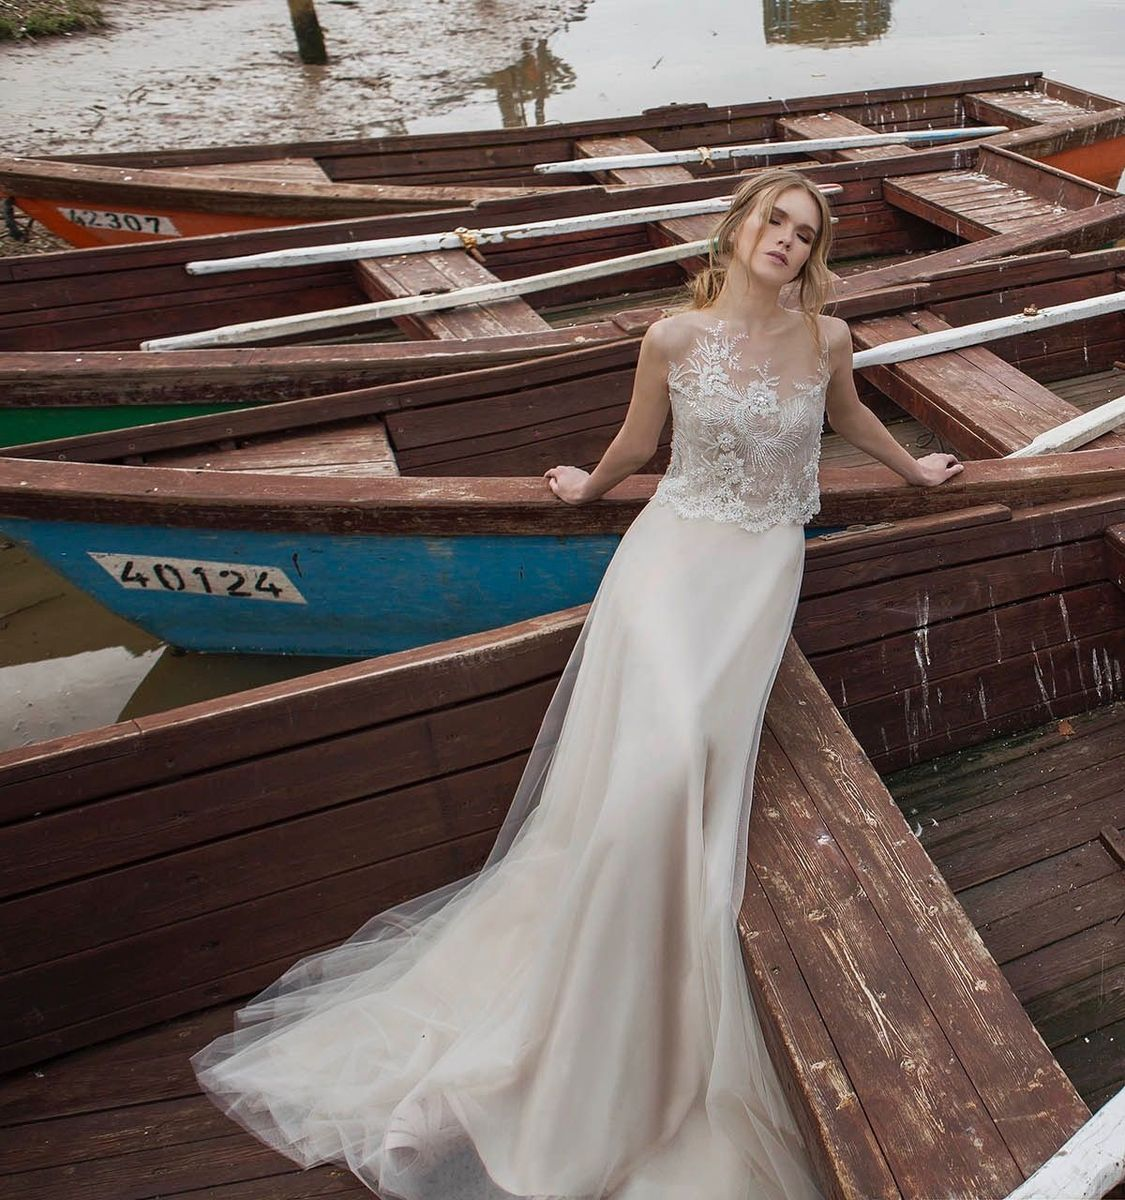 Susan deborah bridal dress attire rochester ny for Wedding dress shops rochester ny